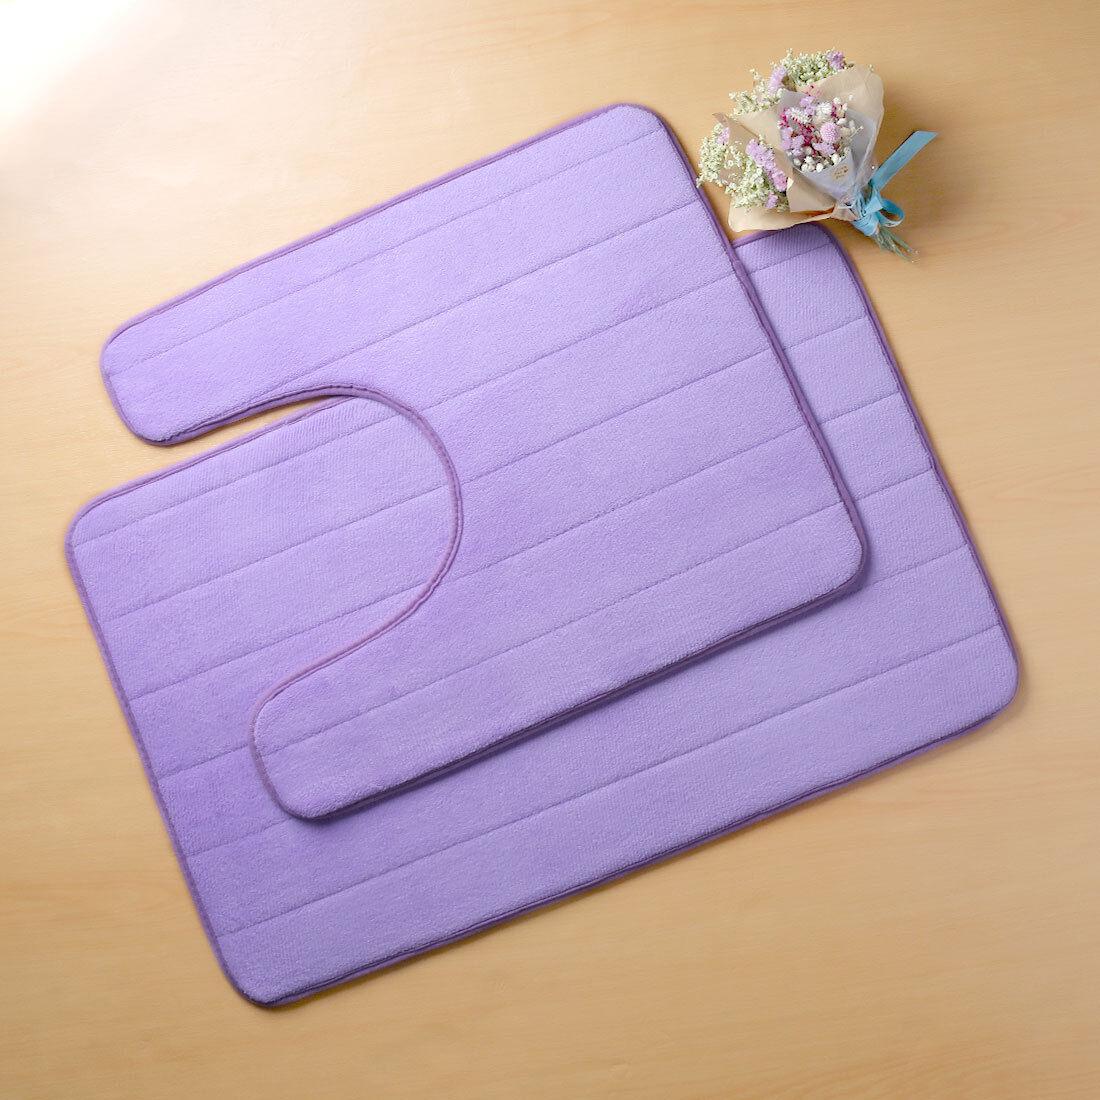 1 2pcs Non Slip Bathroom Rug Mat Memory Foam Contour Floor Rug